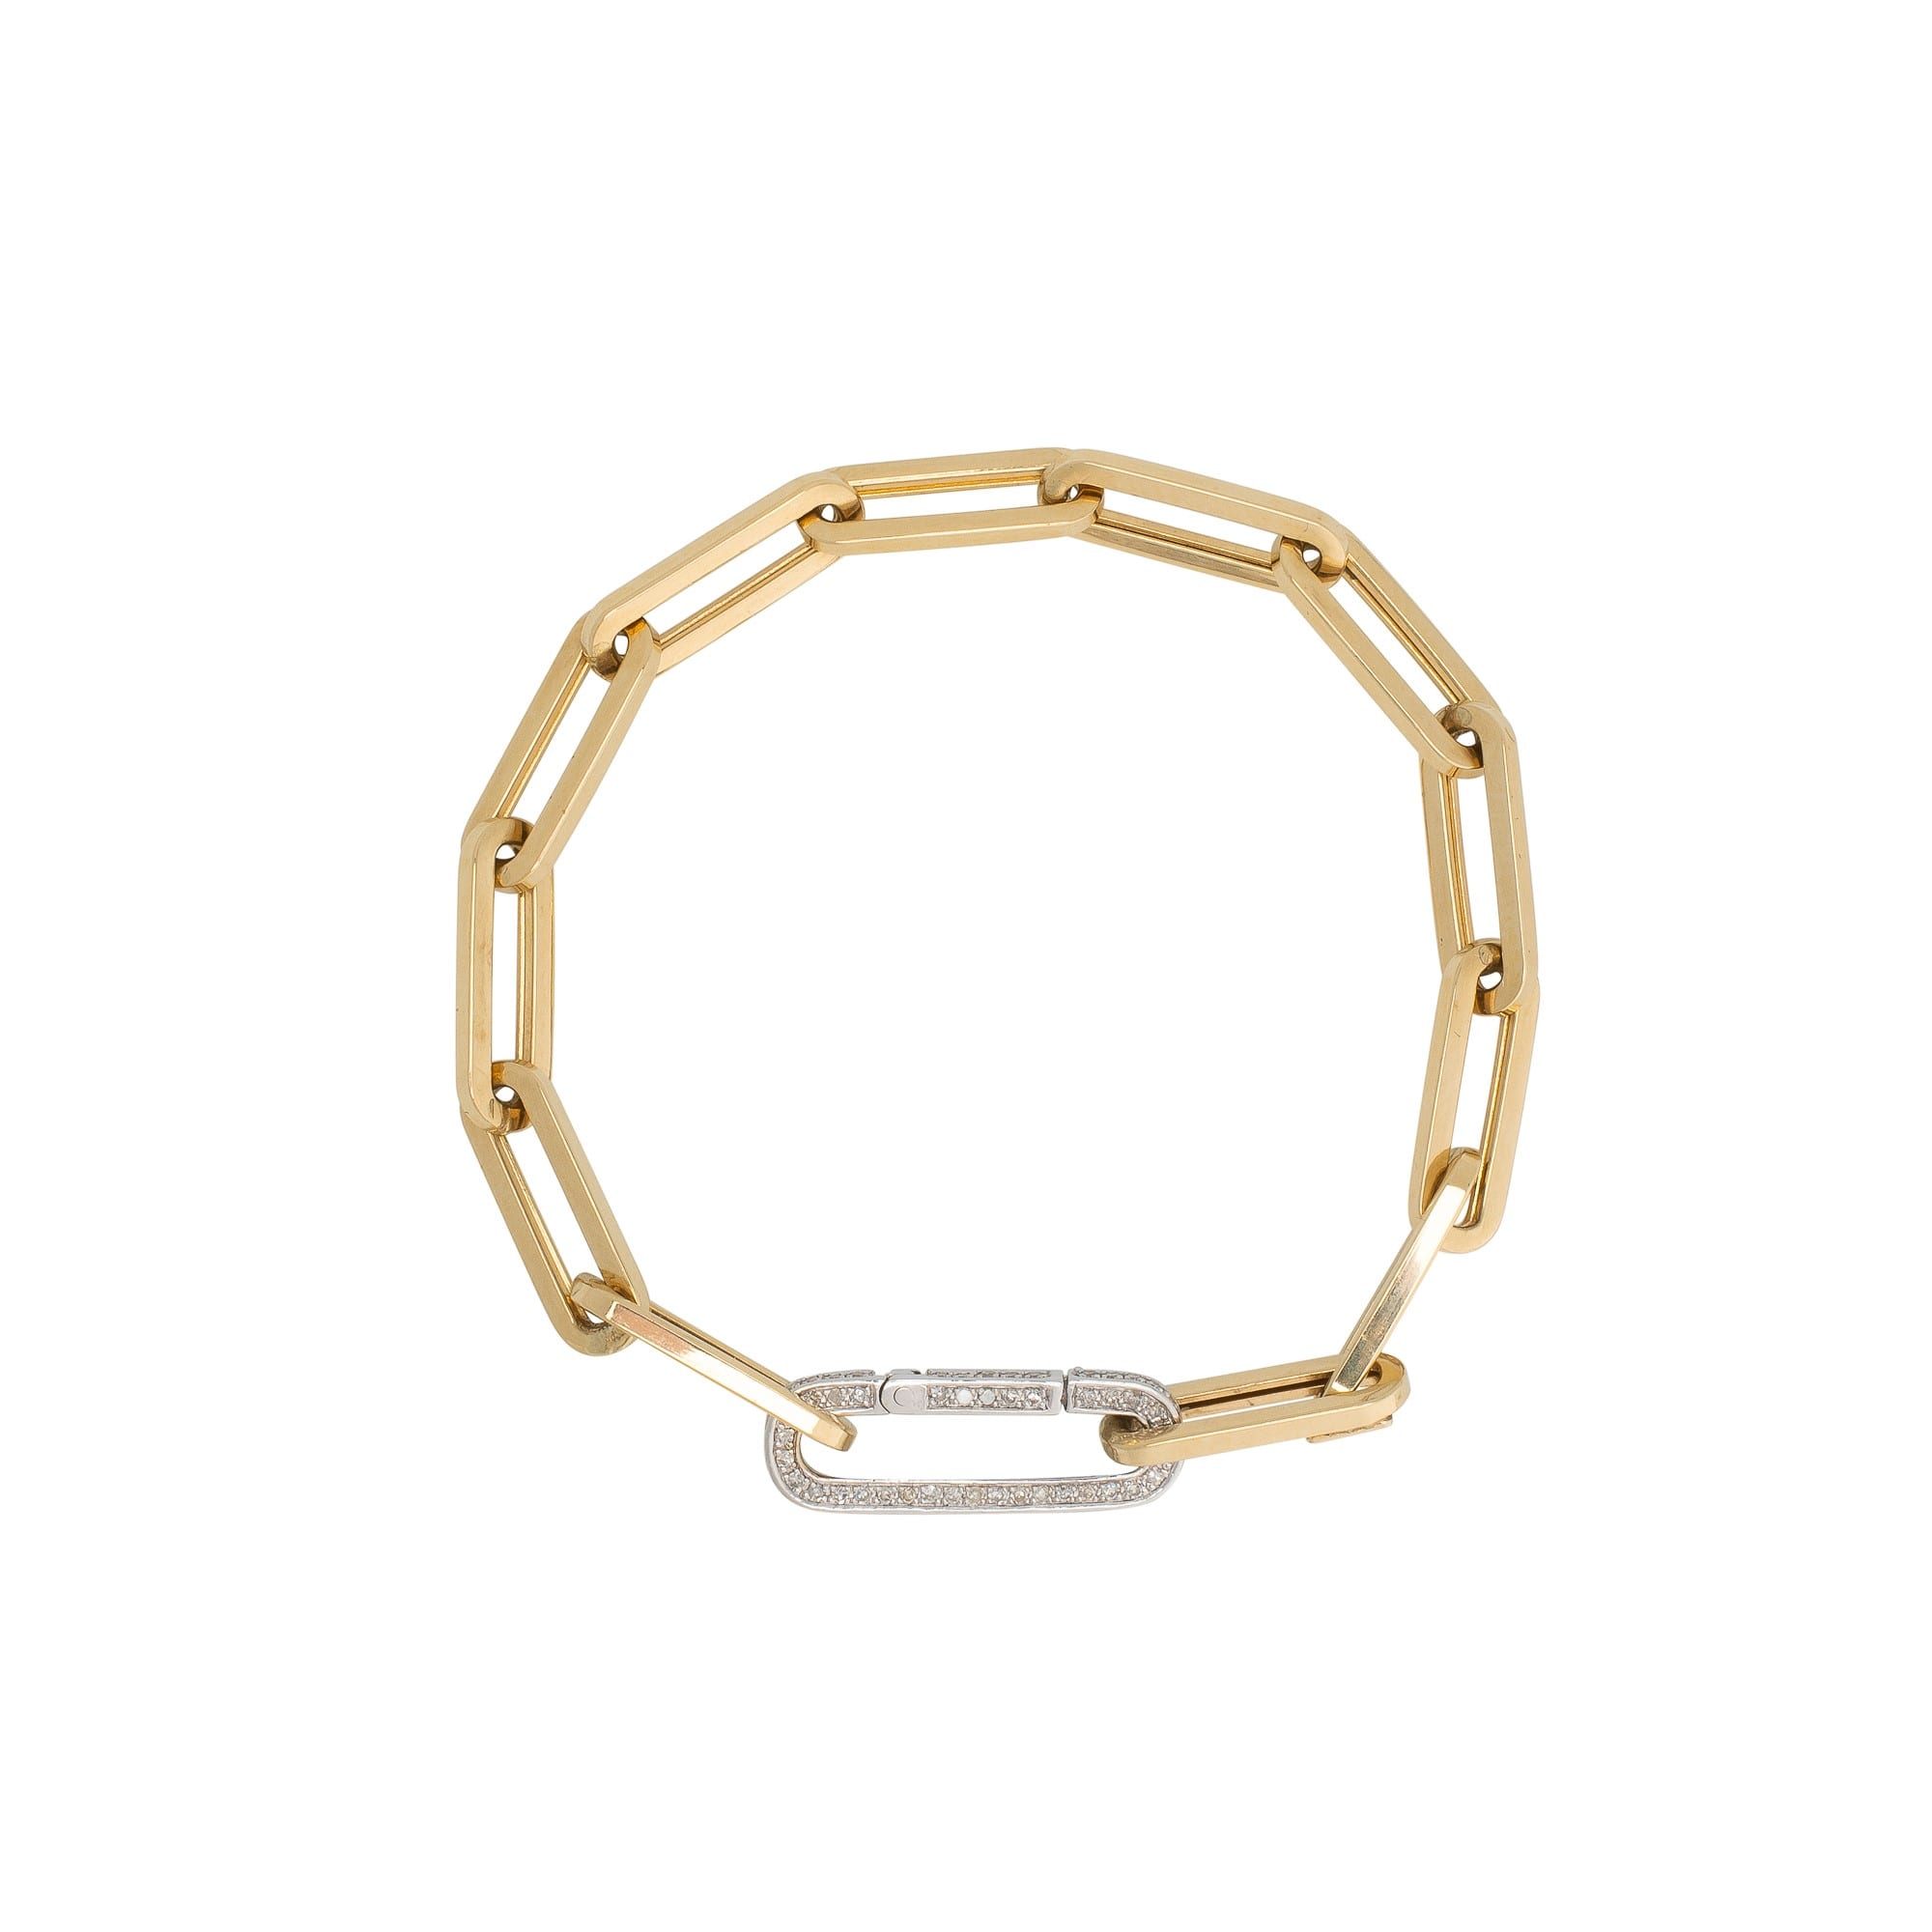 Medium Chain Link Bracelet + Pave Diamond Gold Link Connector Clasp